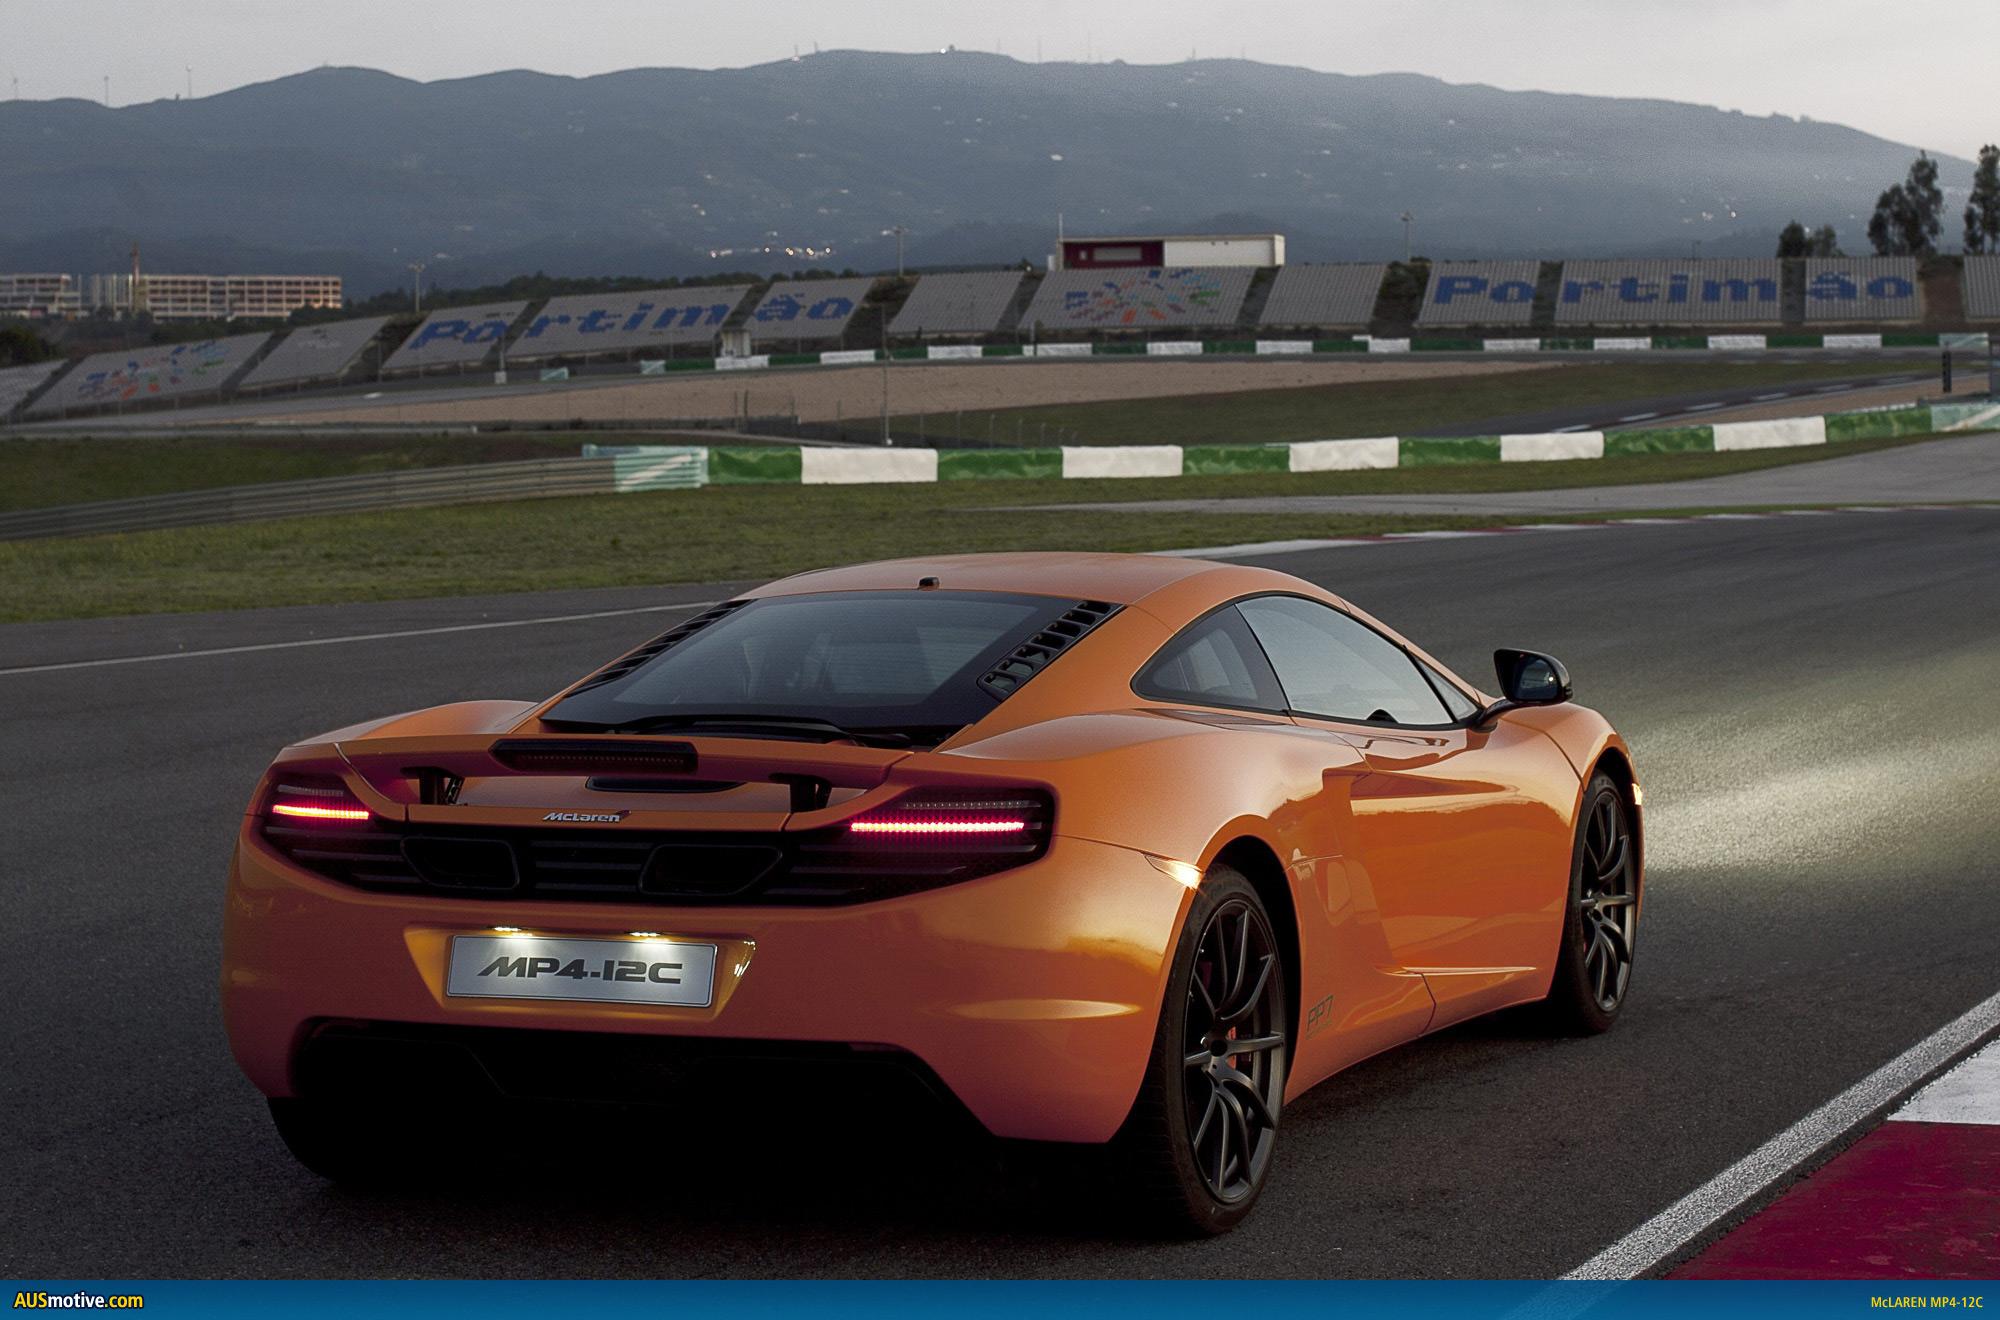 AUSmotive.com » McLaren MP4-12C: Official specs & performance data